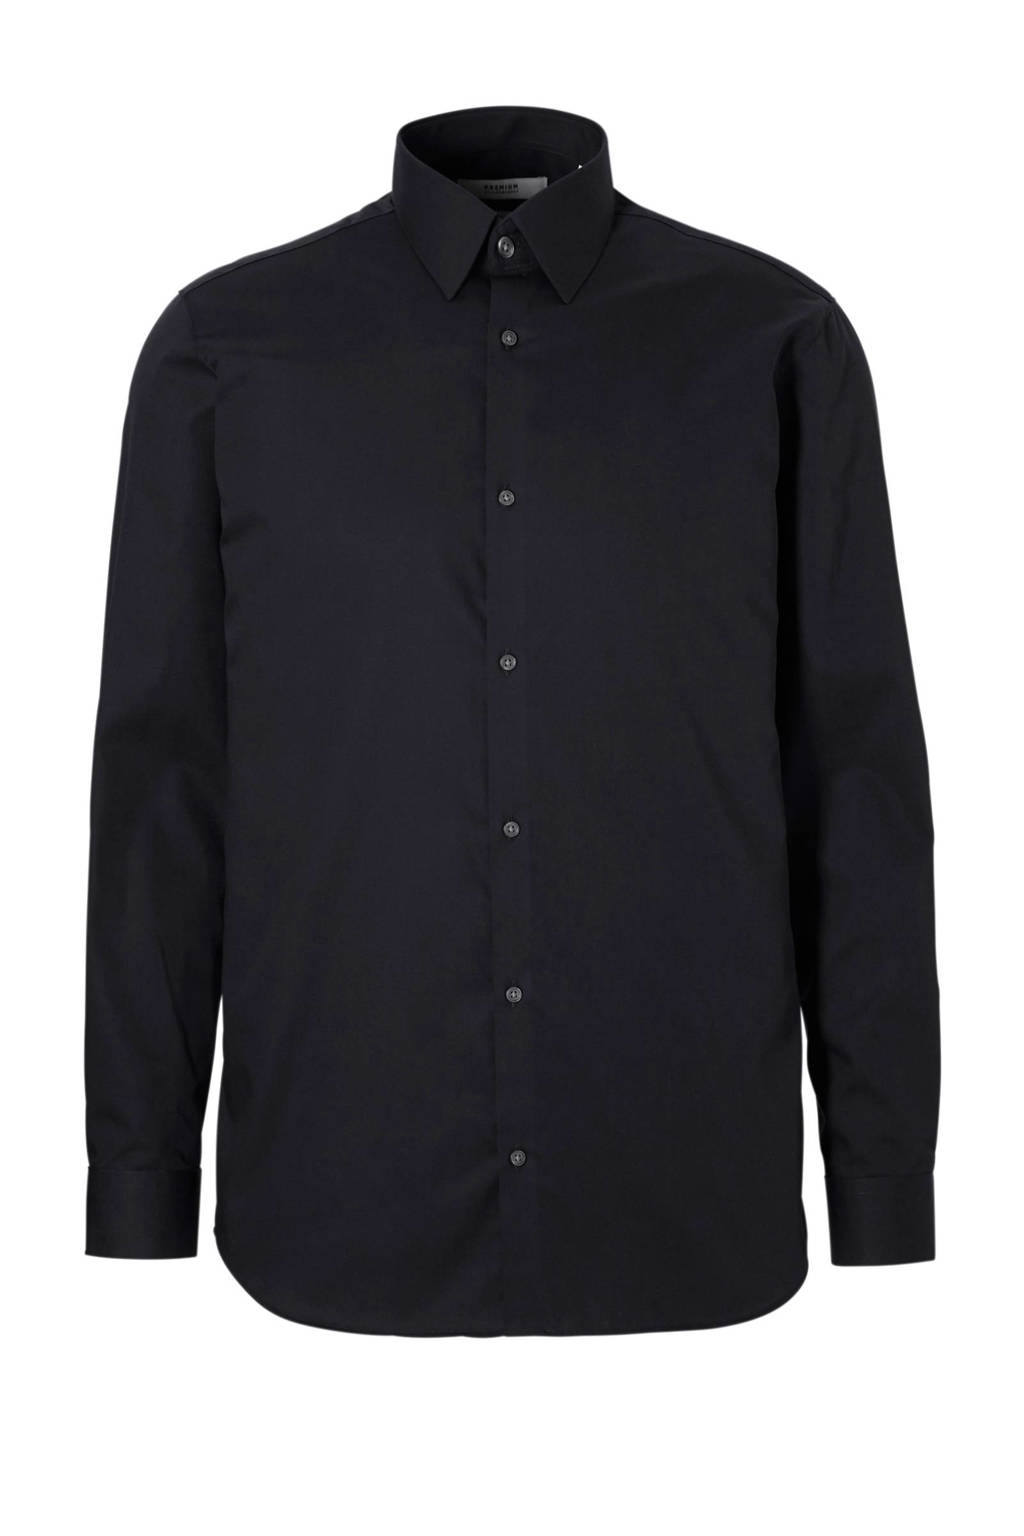 Overhemd Zwart Slim Fit.Jack Jones Premium Slim Fit Overhemd Wehkamp